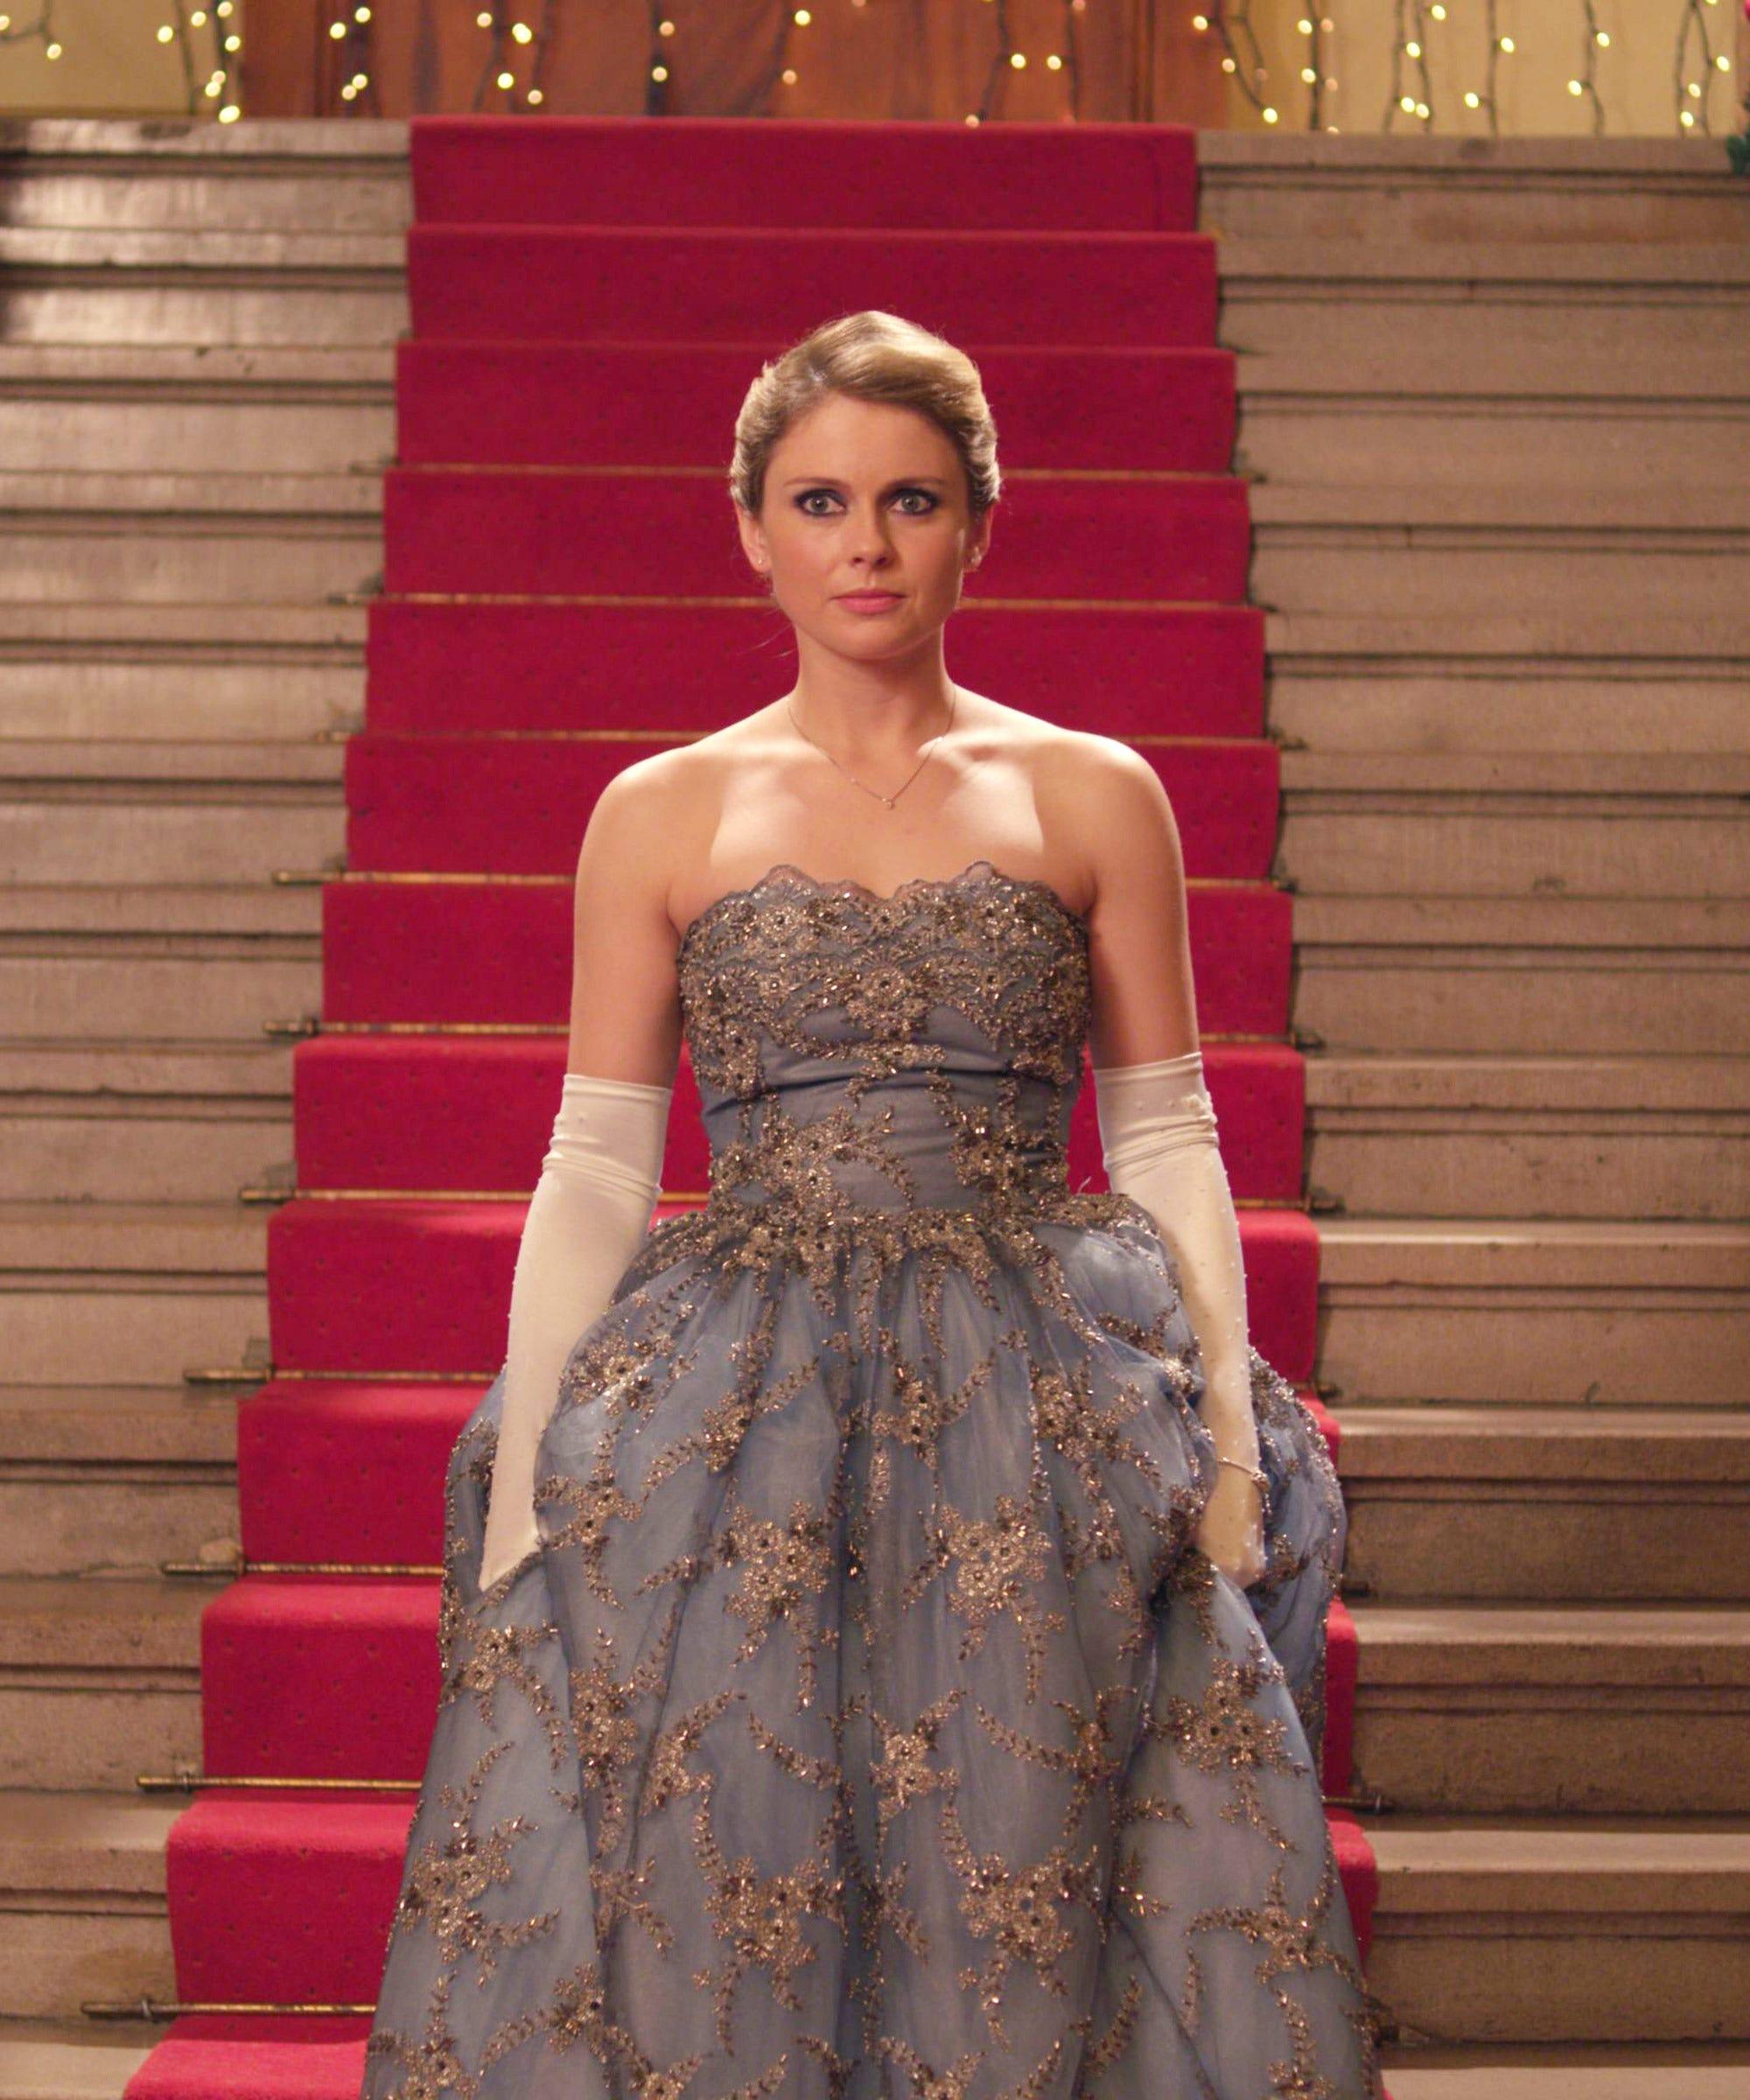 Christmas Inheritance Eliza Taylor.Netflix Christmas Prince Vs Christmas Inheritance Movie